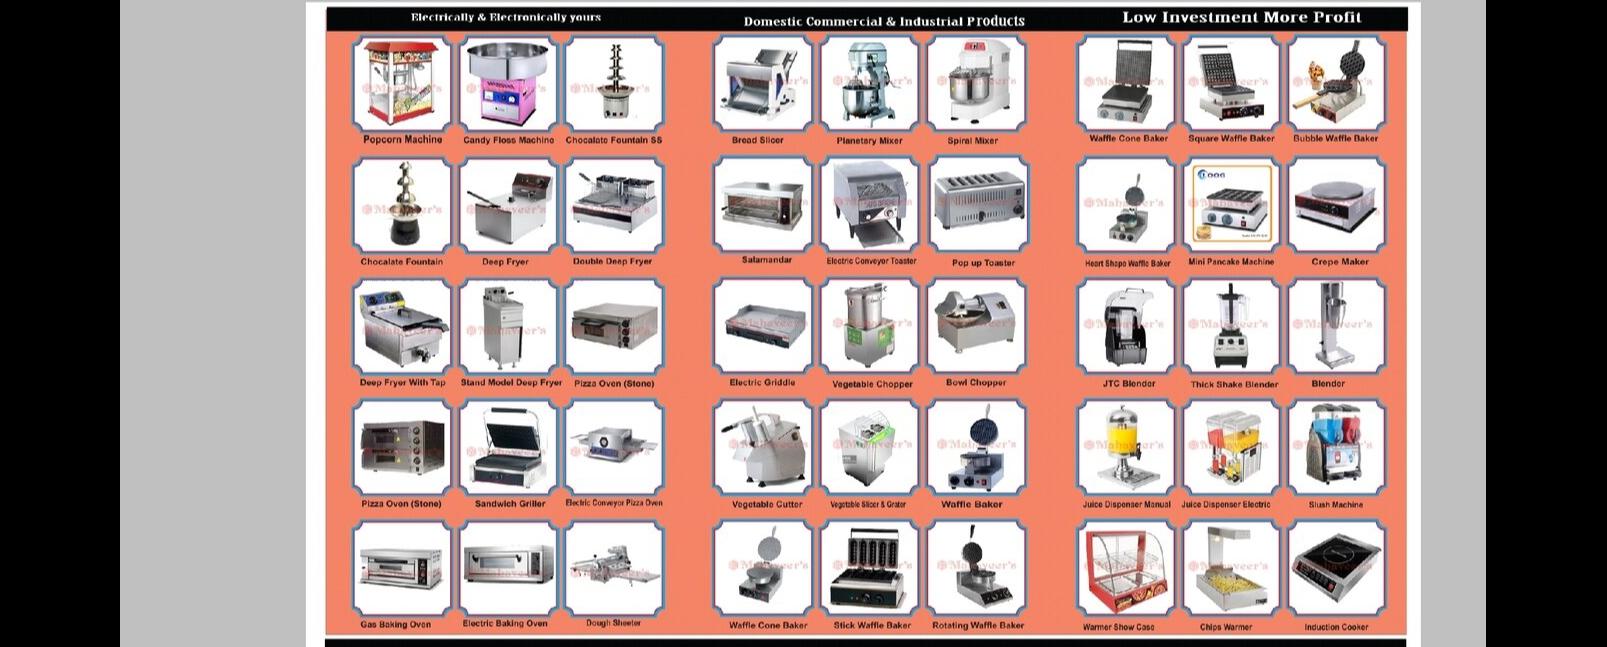 Mahaveer Electronics Electricals - Food Processing Machinery Supplier in Jeera-Bhoiguda, Hyderabad